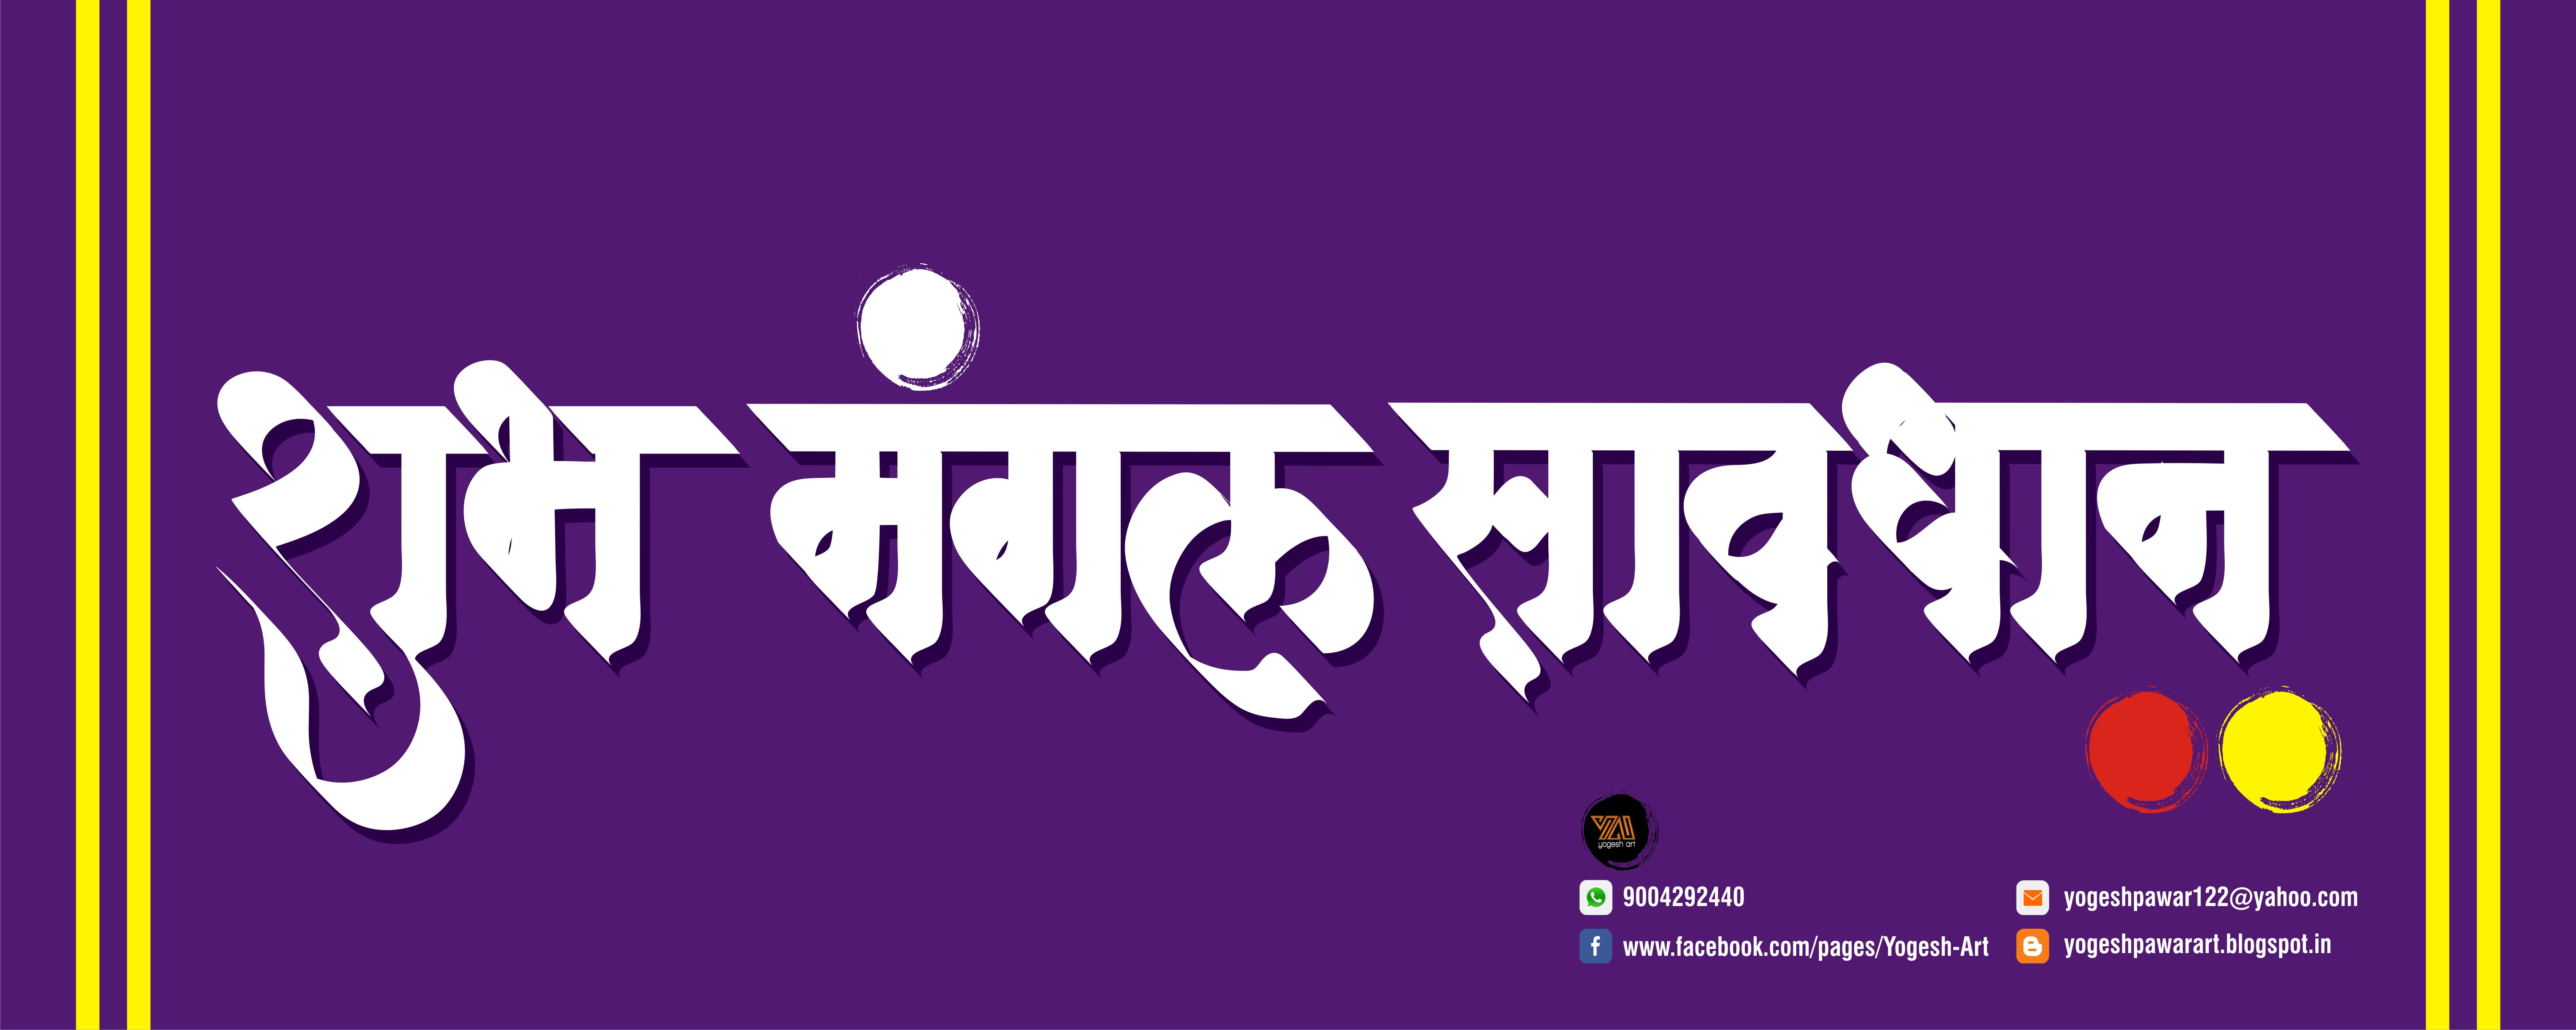 Shubh Mangal Savdhan Marathi Calligraphy   Marathi